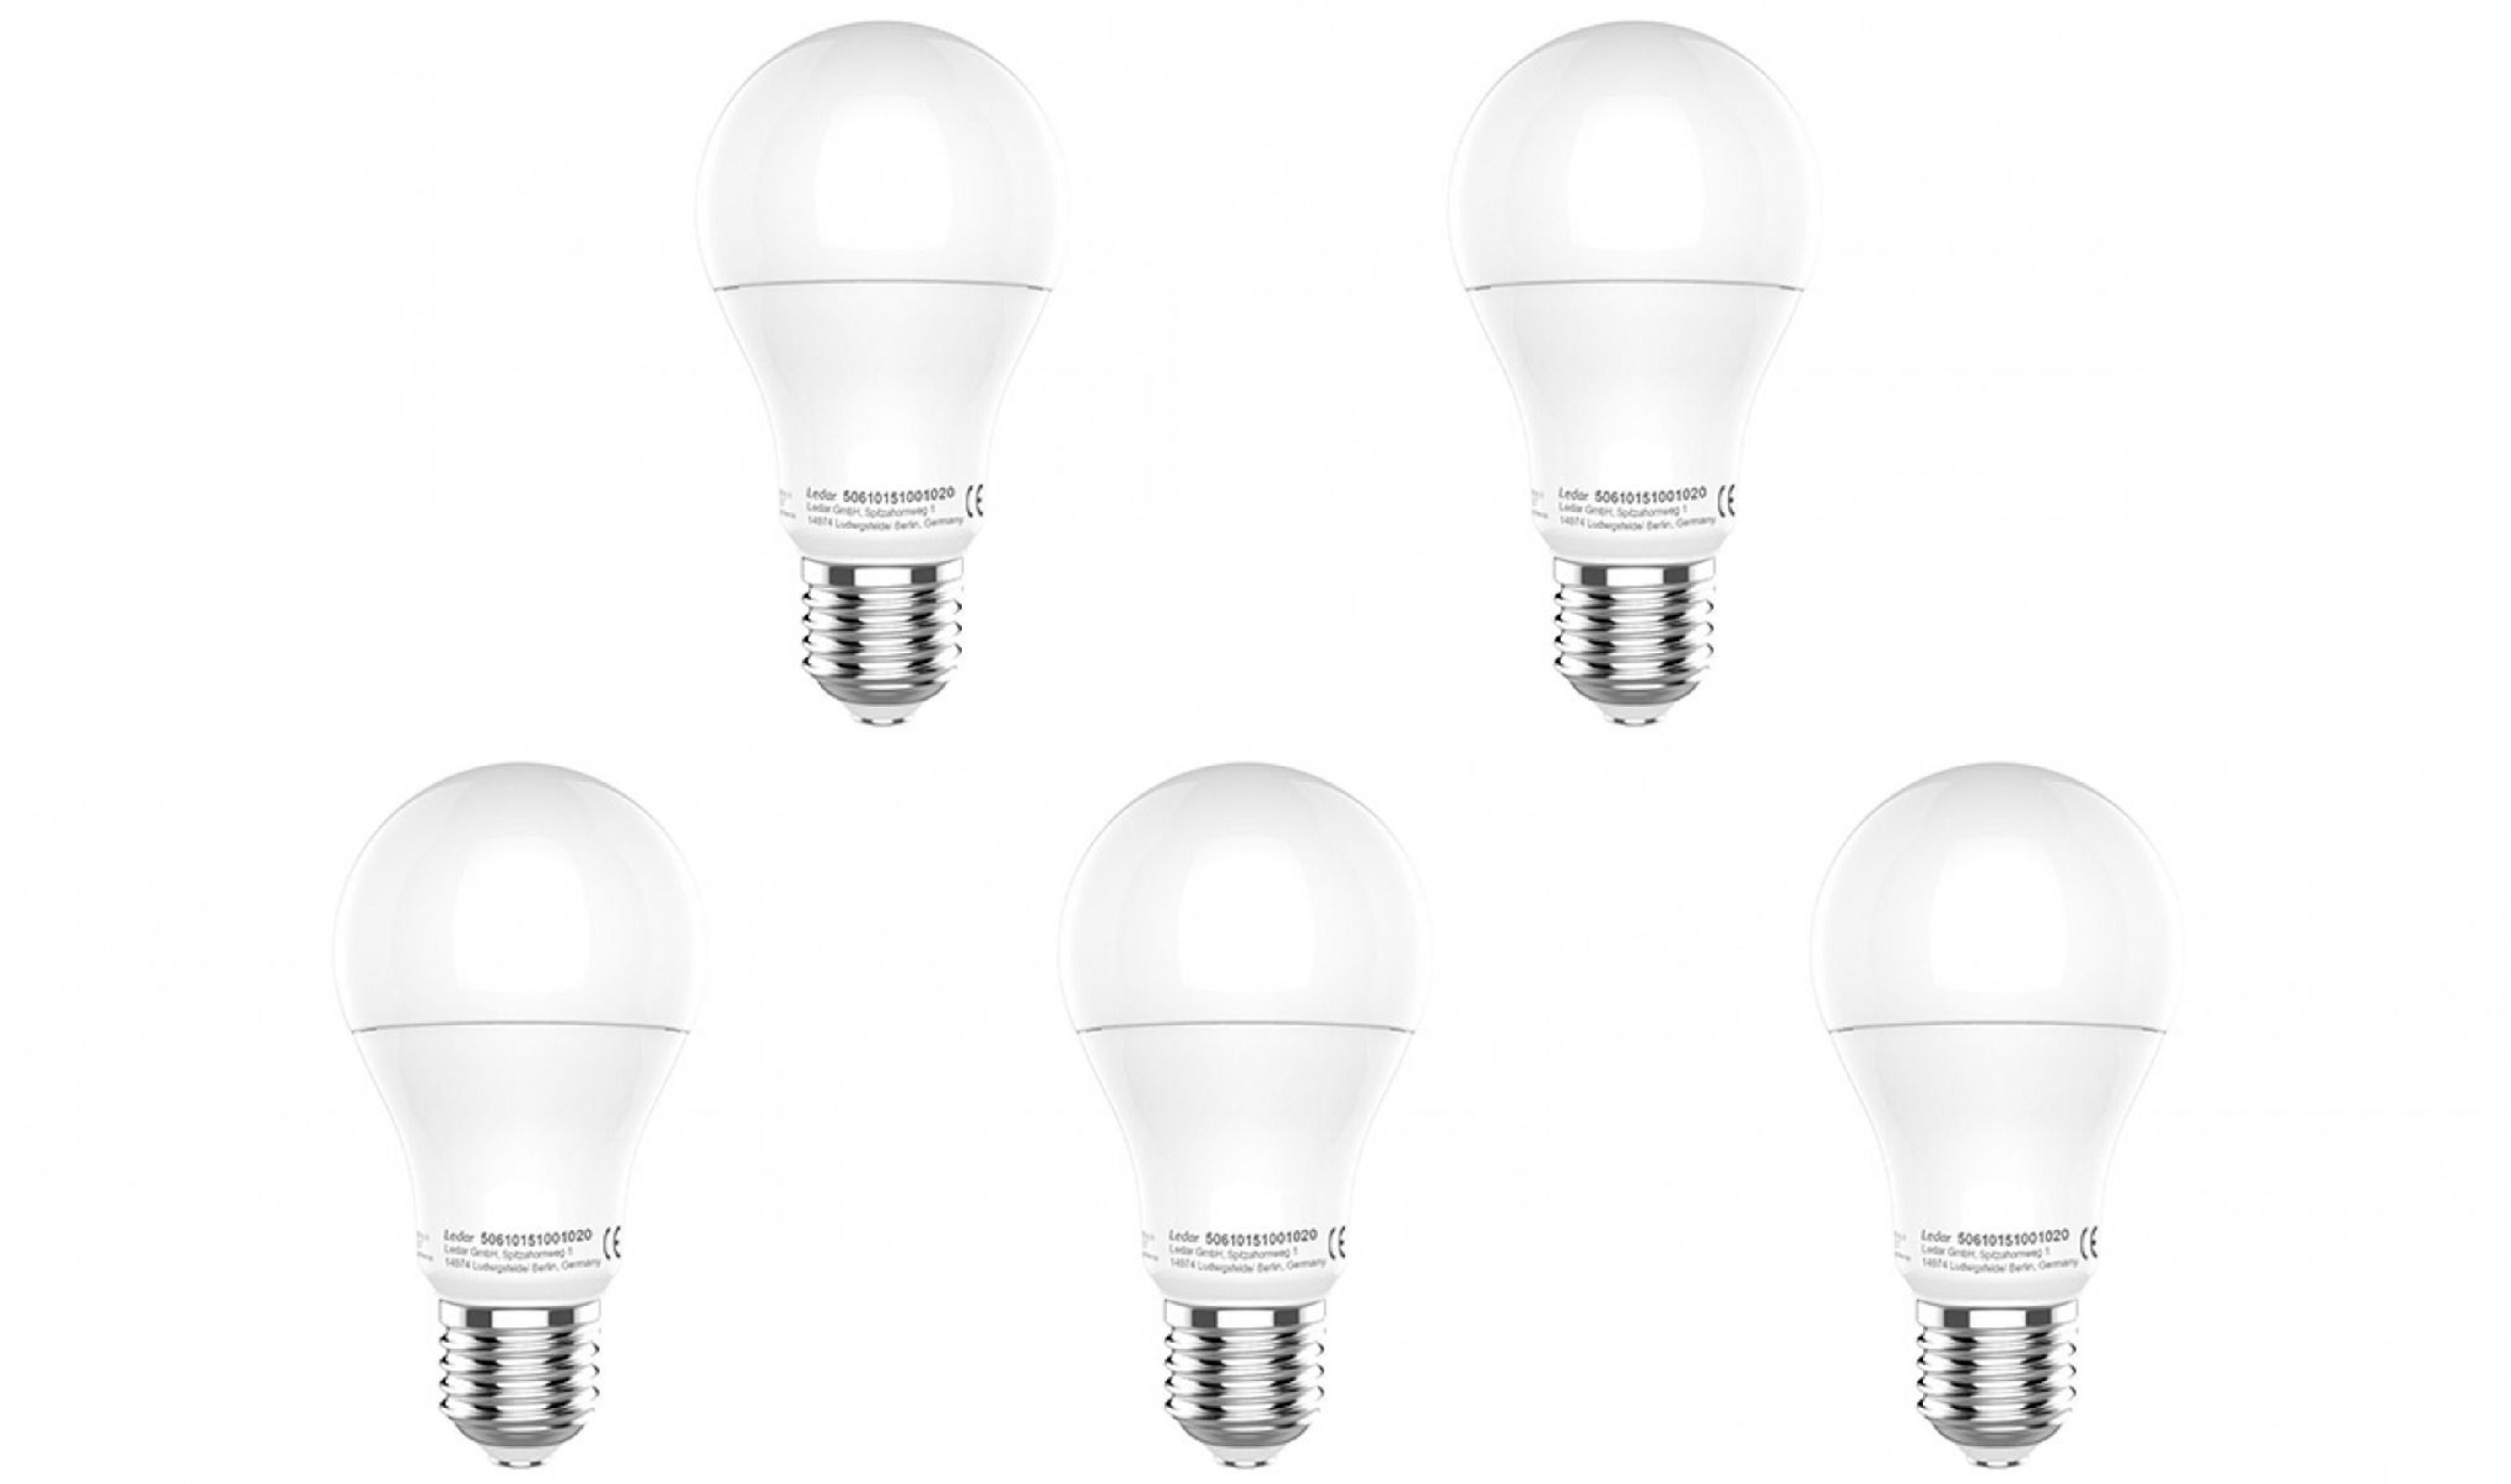 Led Leuchtmittel Set 5x E27 Ledino Gluhbirne 9 Watt Lampe